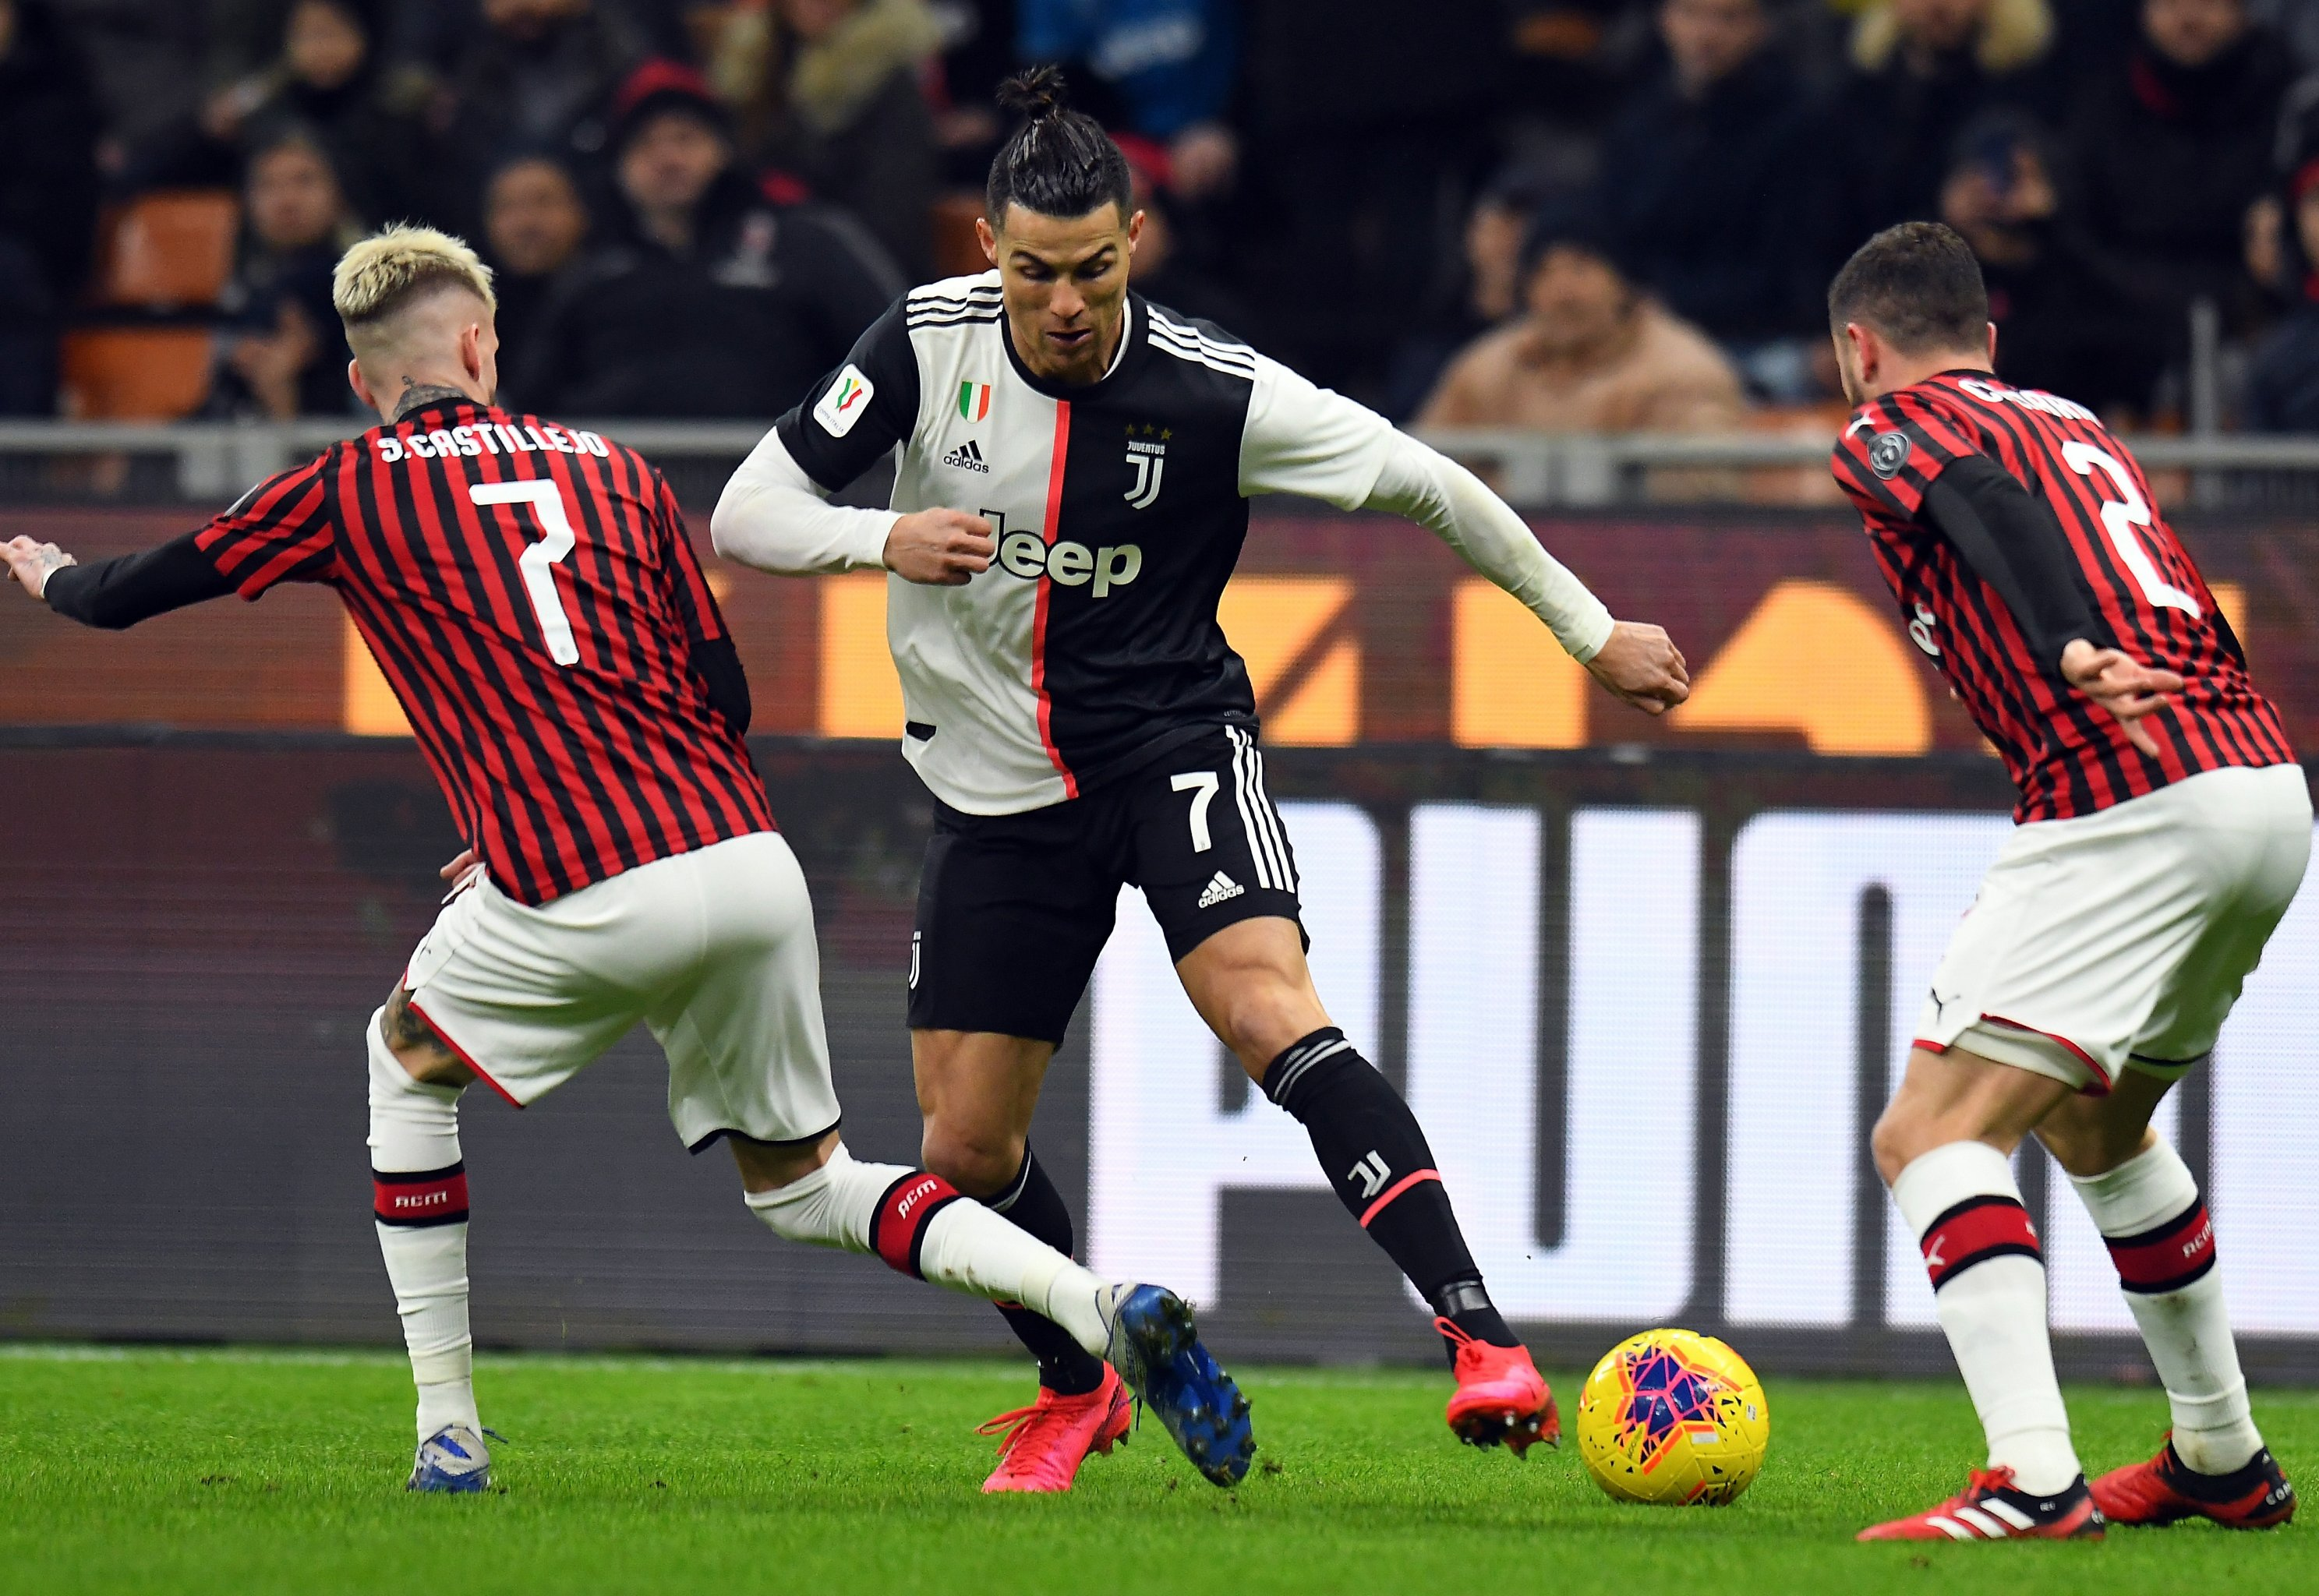 Juventus Vs Milan 2020 Coppa Italia Semi Final Tv Schedule Live Stream Bleacher Report Latest News Videos And Highlights